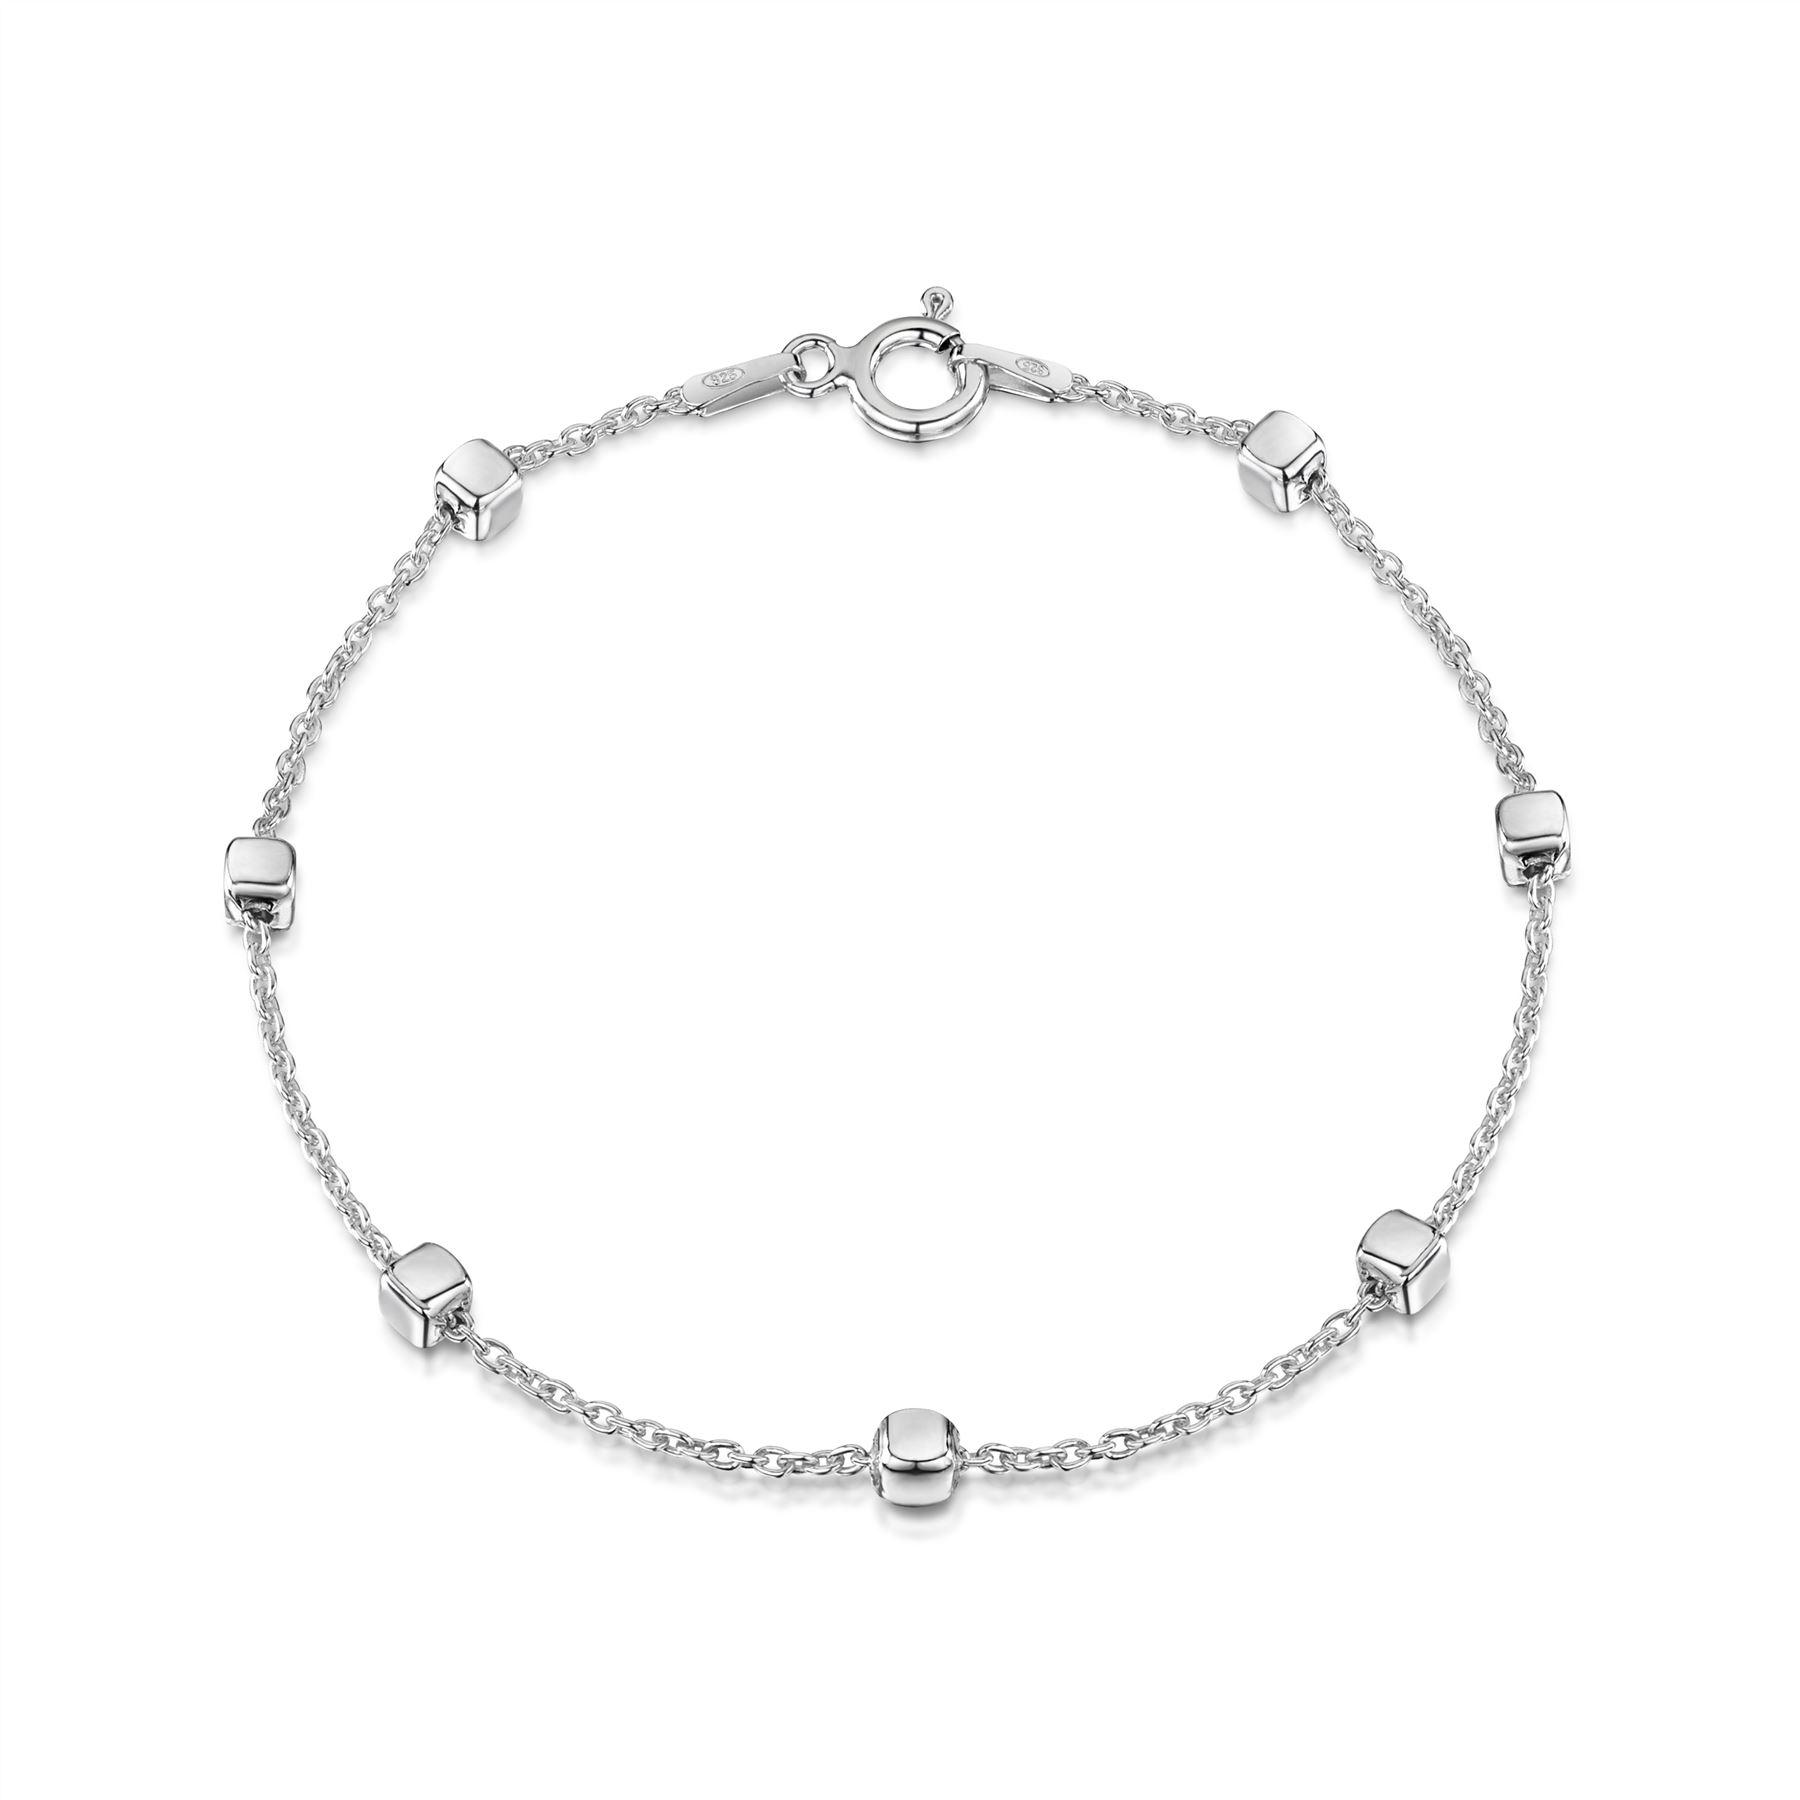 Amberta-Pulsera-en-Autentica-Plata-De-Ley-925-Brazalete-Precioso-para-Mujer miniatura 12